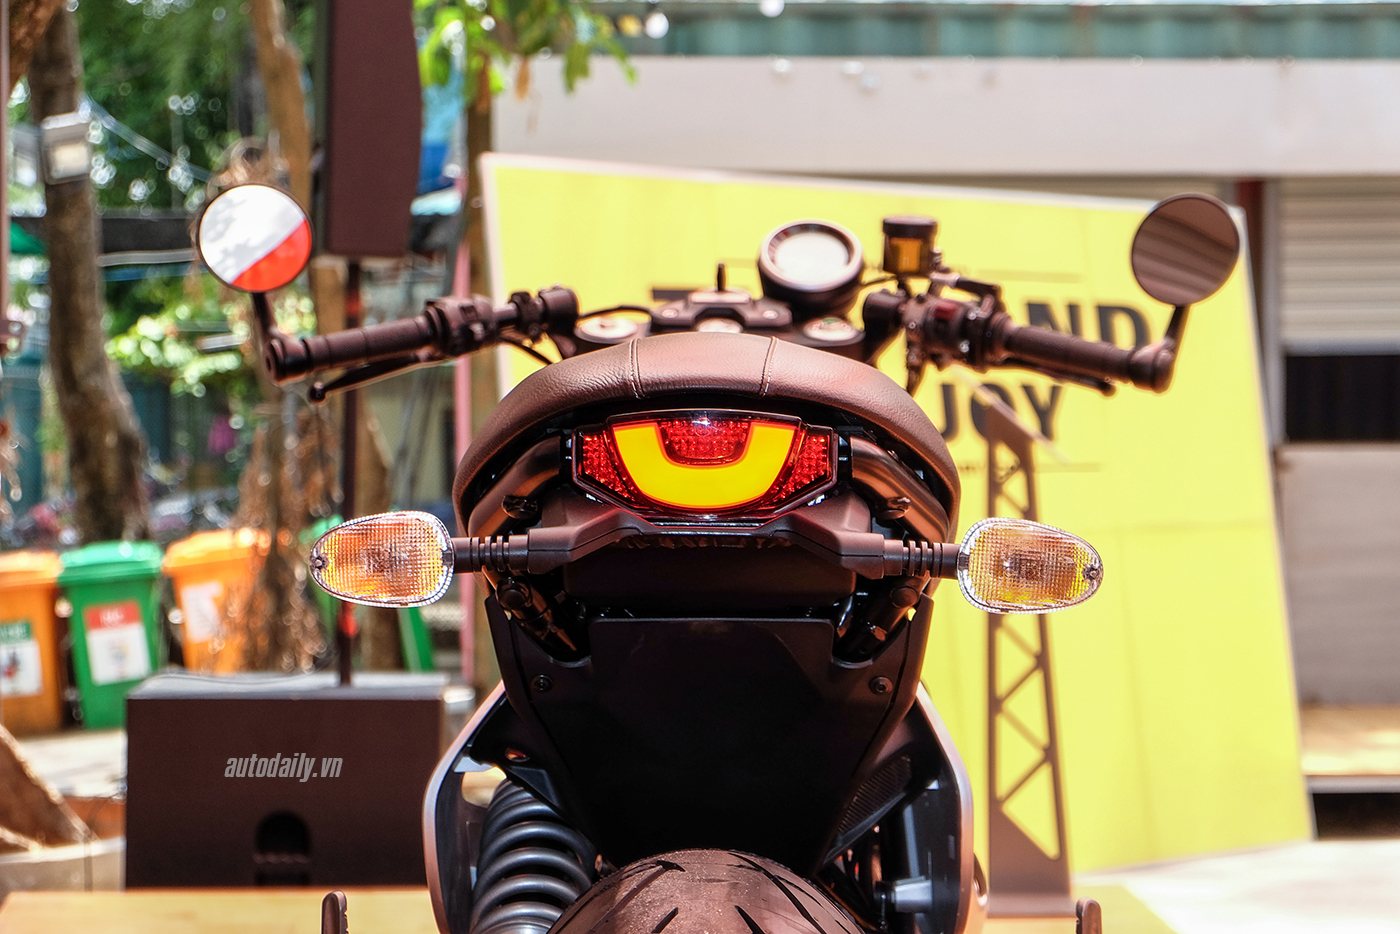 ducati-scrambler-cafe-racer-20.jpg